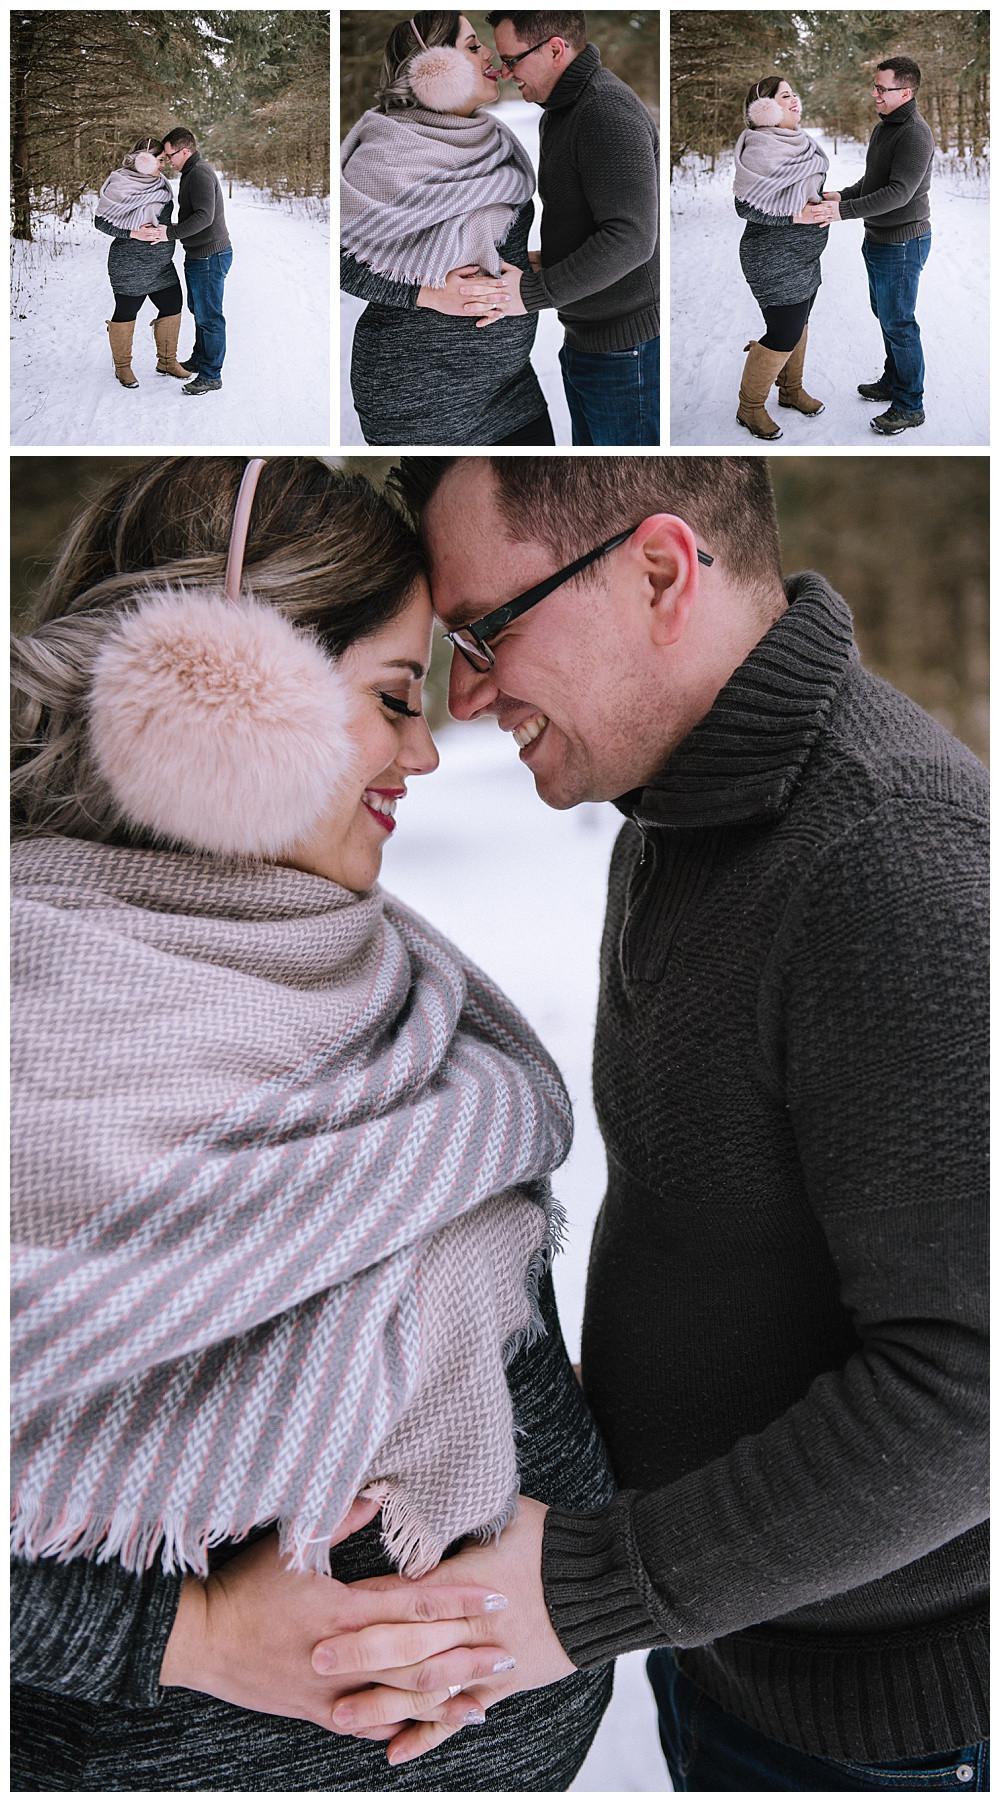 Ottawa Photographer, Ottawa Maternity Session, Ottawa Boudoir Photographer, Ottawa Wedding Photographer